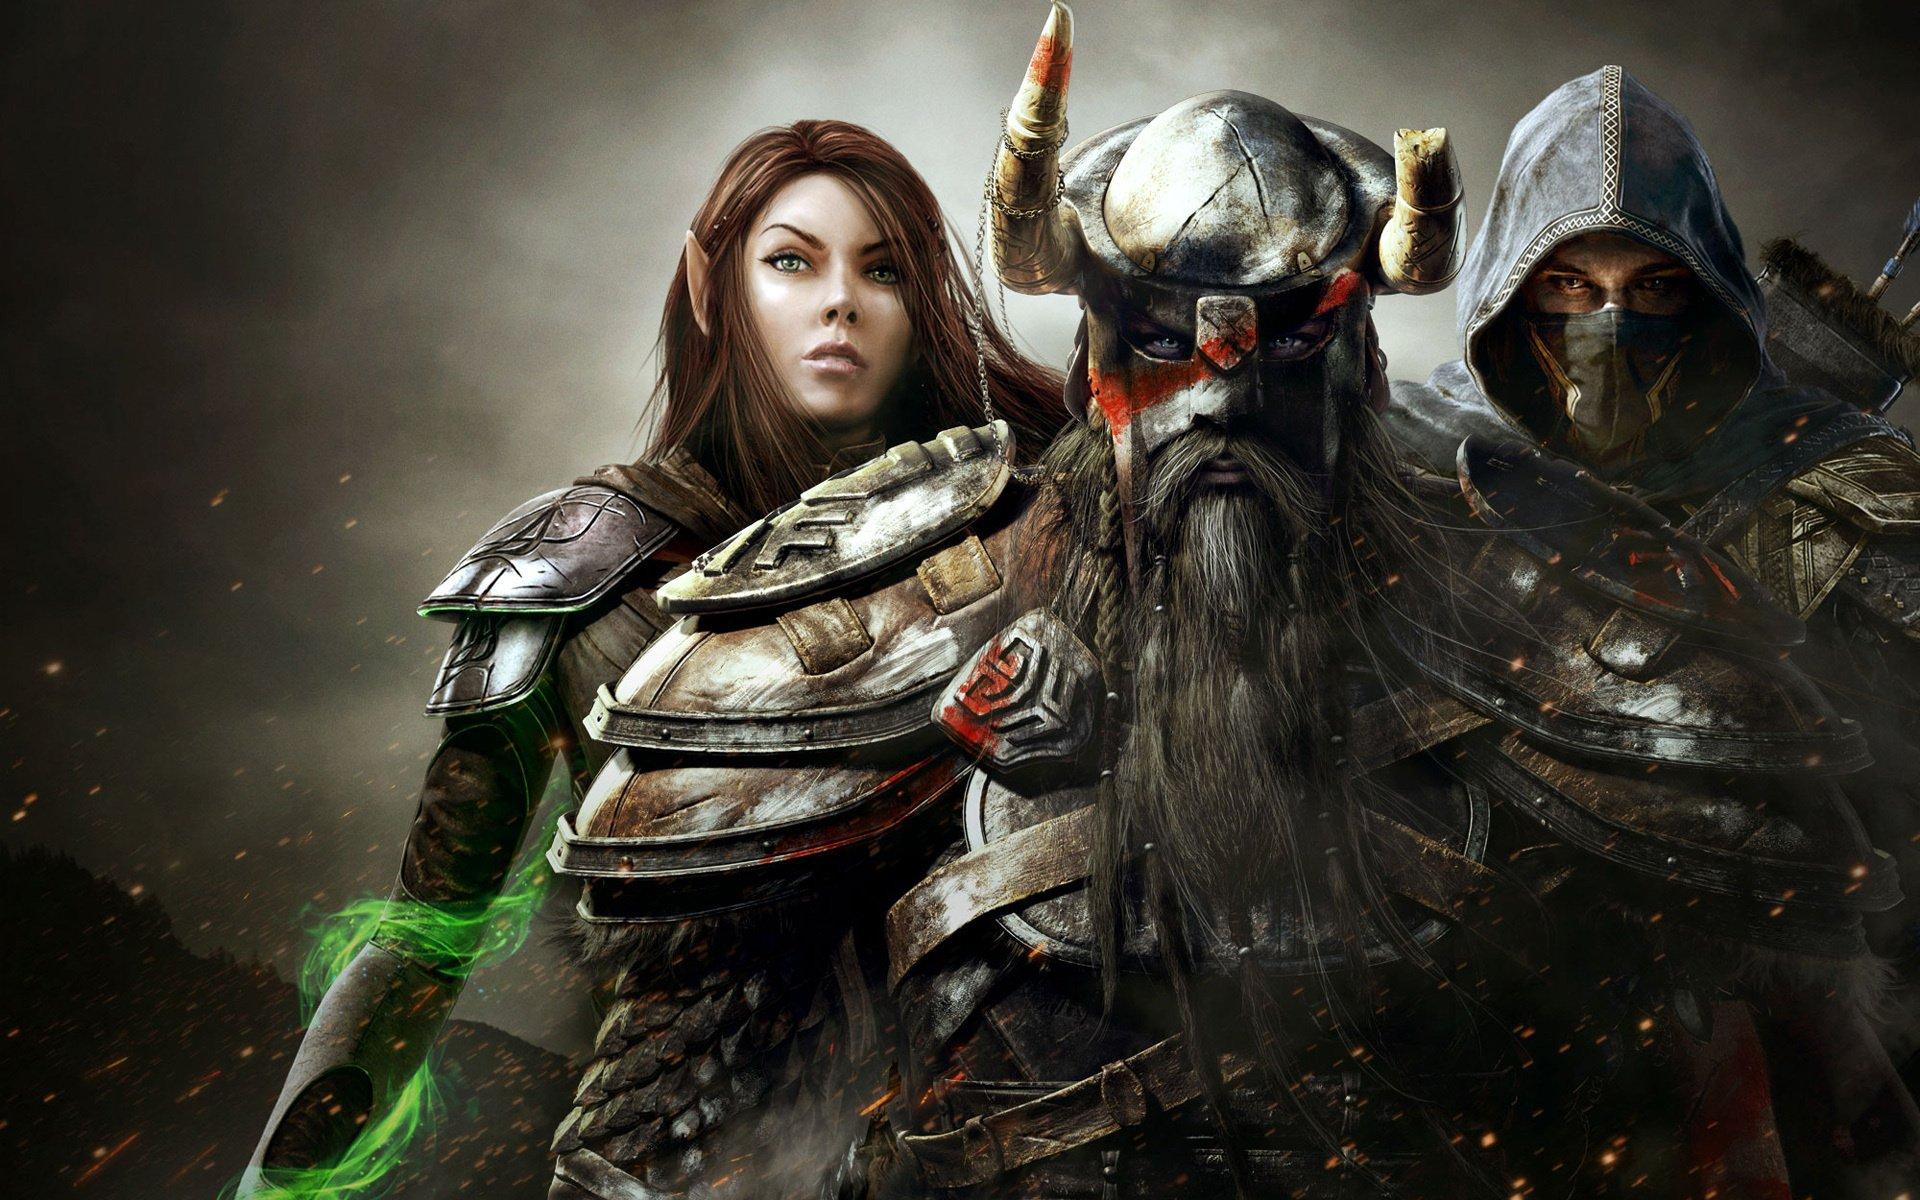 The Elder Scrolls Online Hd Wallpaper Background Image